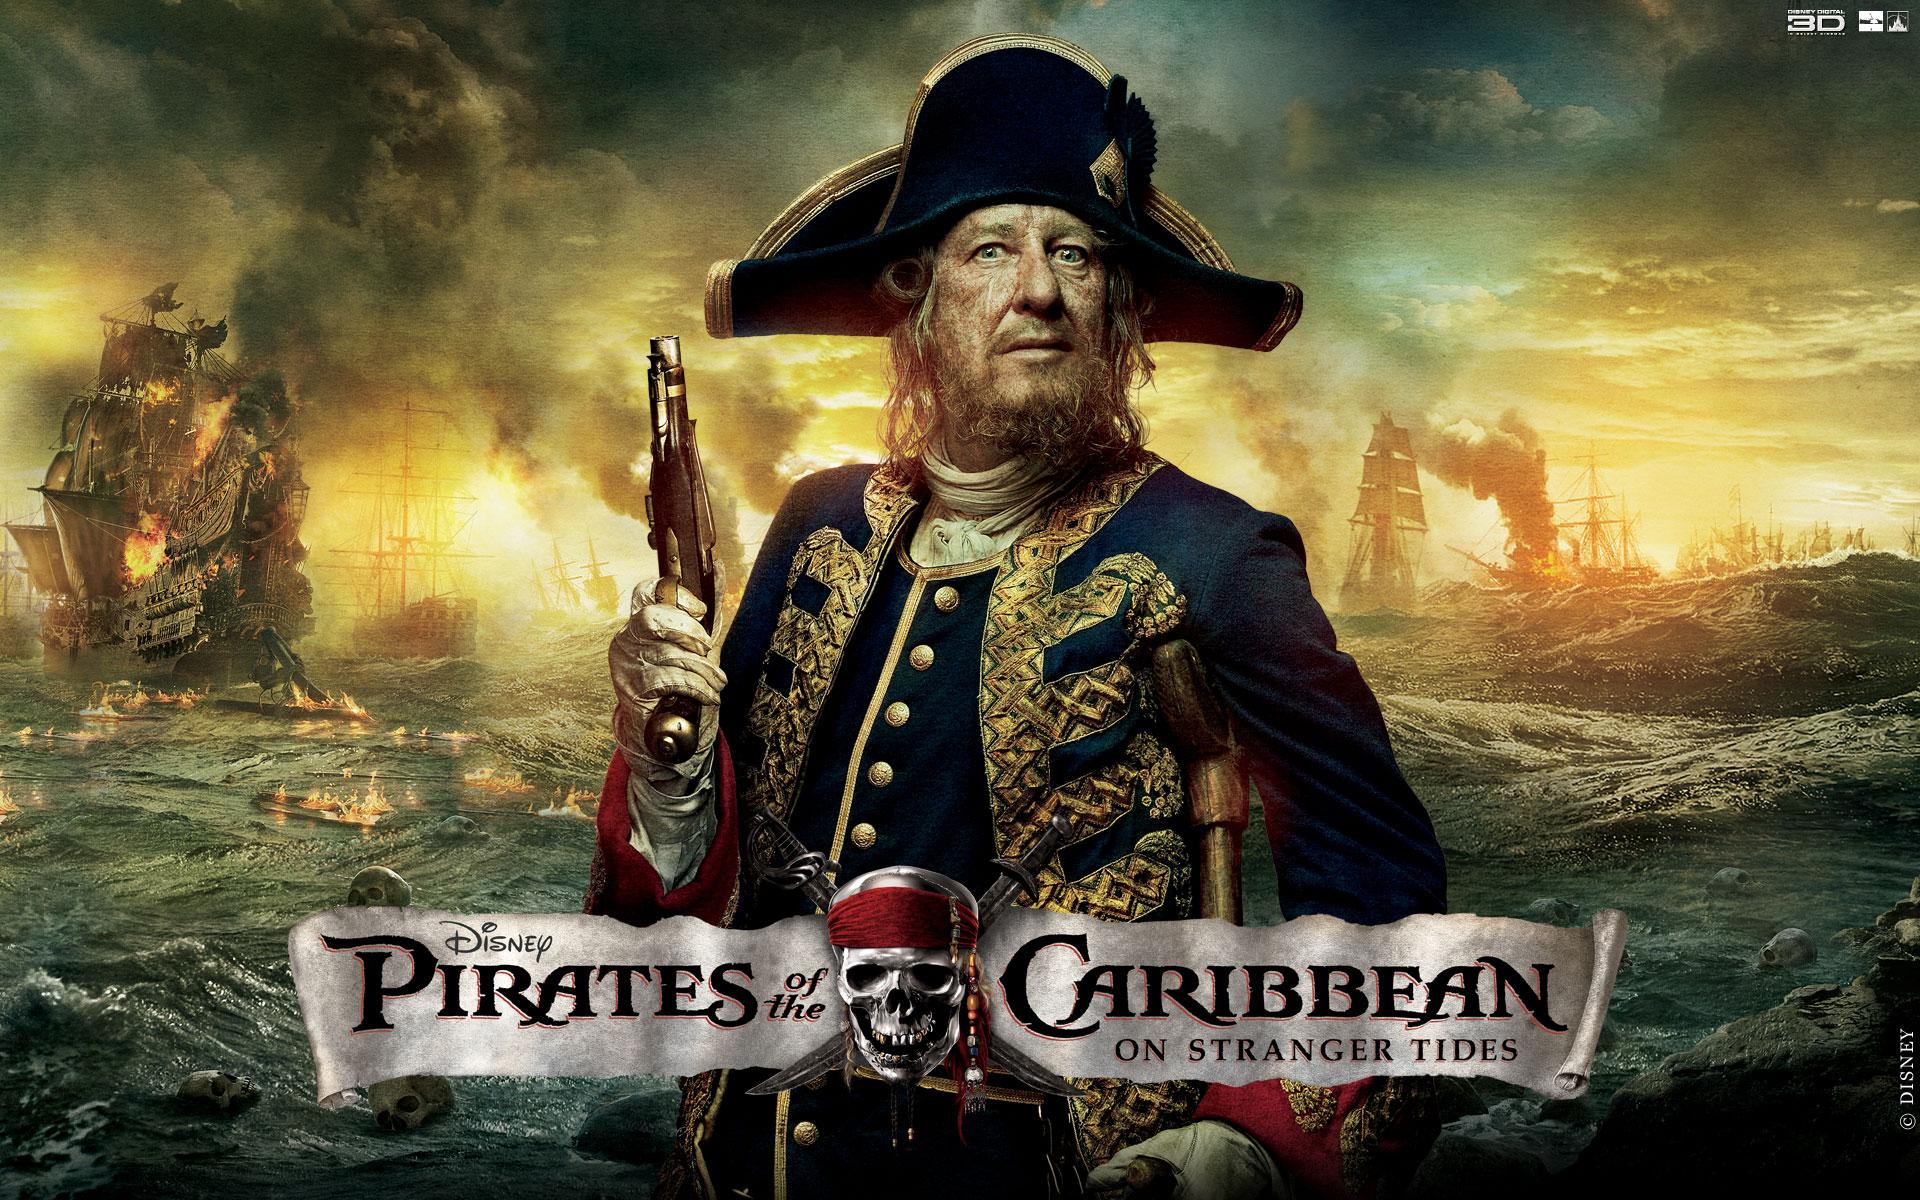 Barbossa Caribbean Pirates Characters Widescreen Desktop Full HD 1920x1200